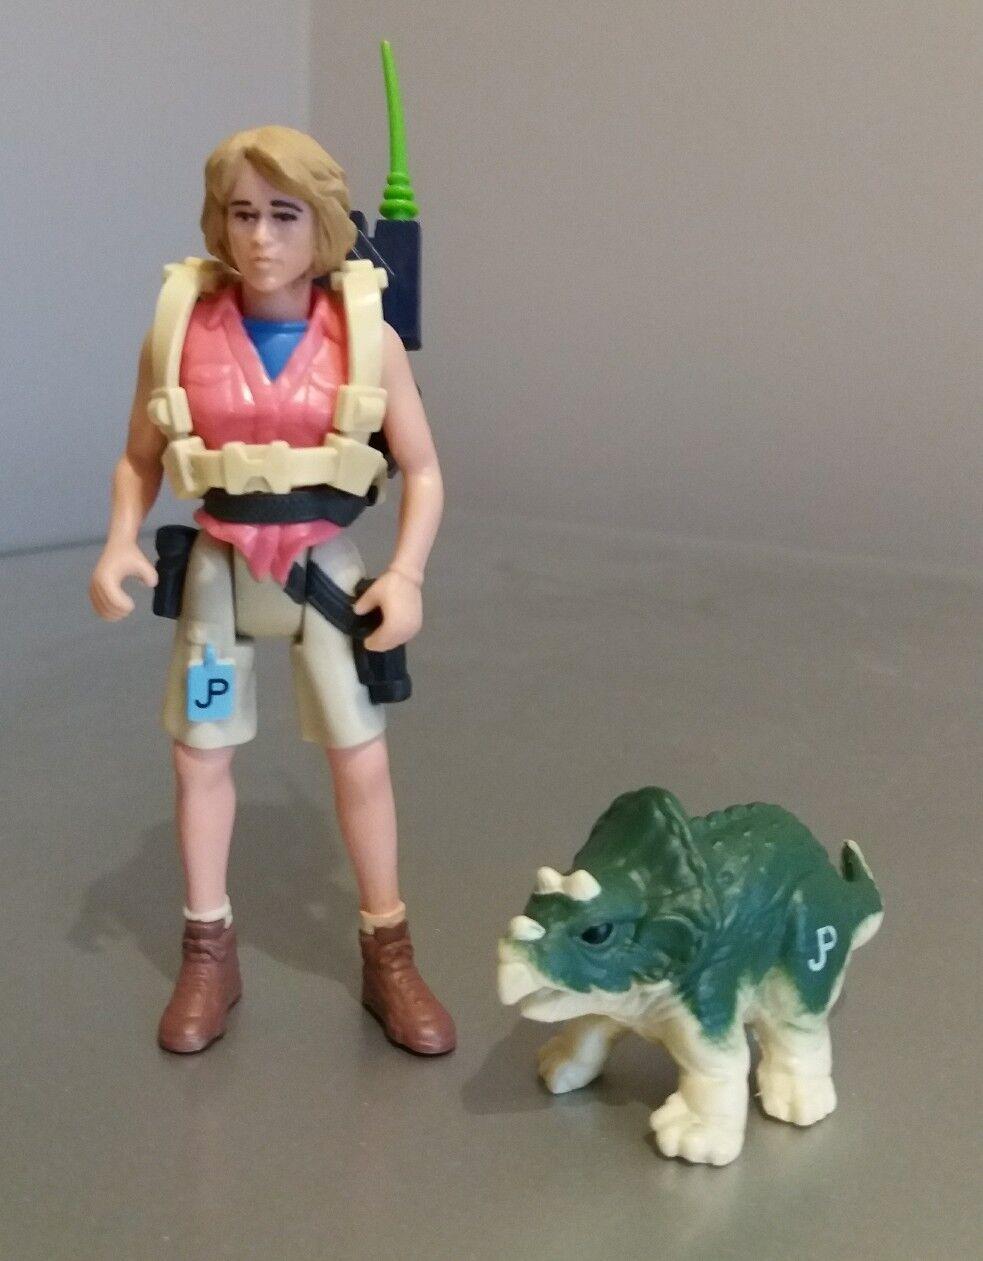 Rare Jurassic Park Ellie Satter Figure original accessories Kenner 1993